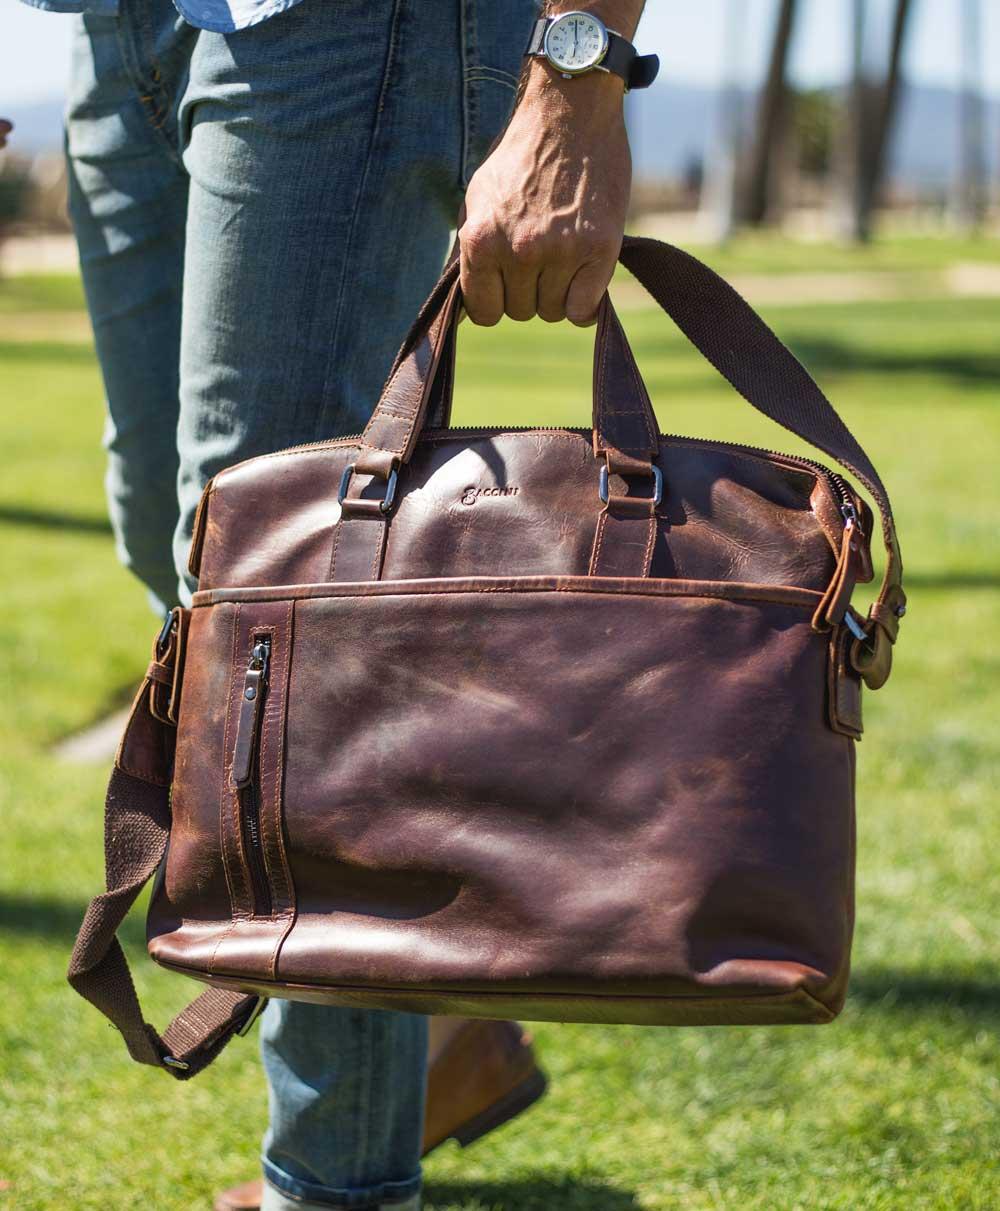 Best affordable leather briefcase under $100